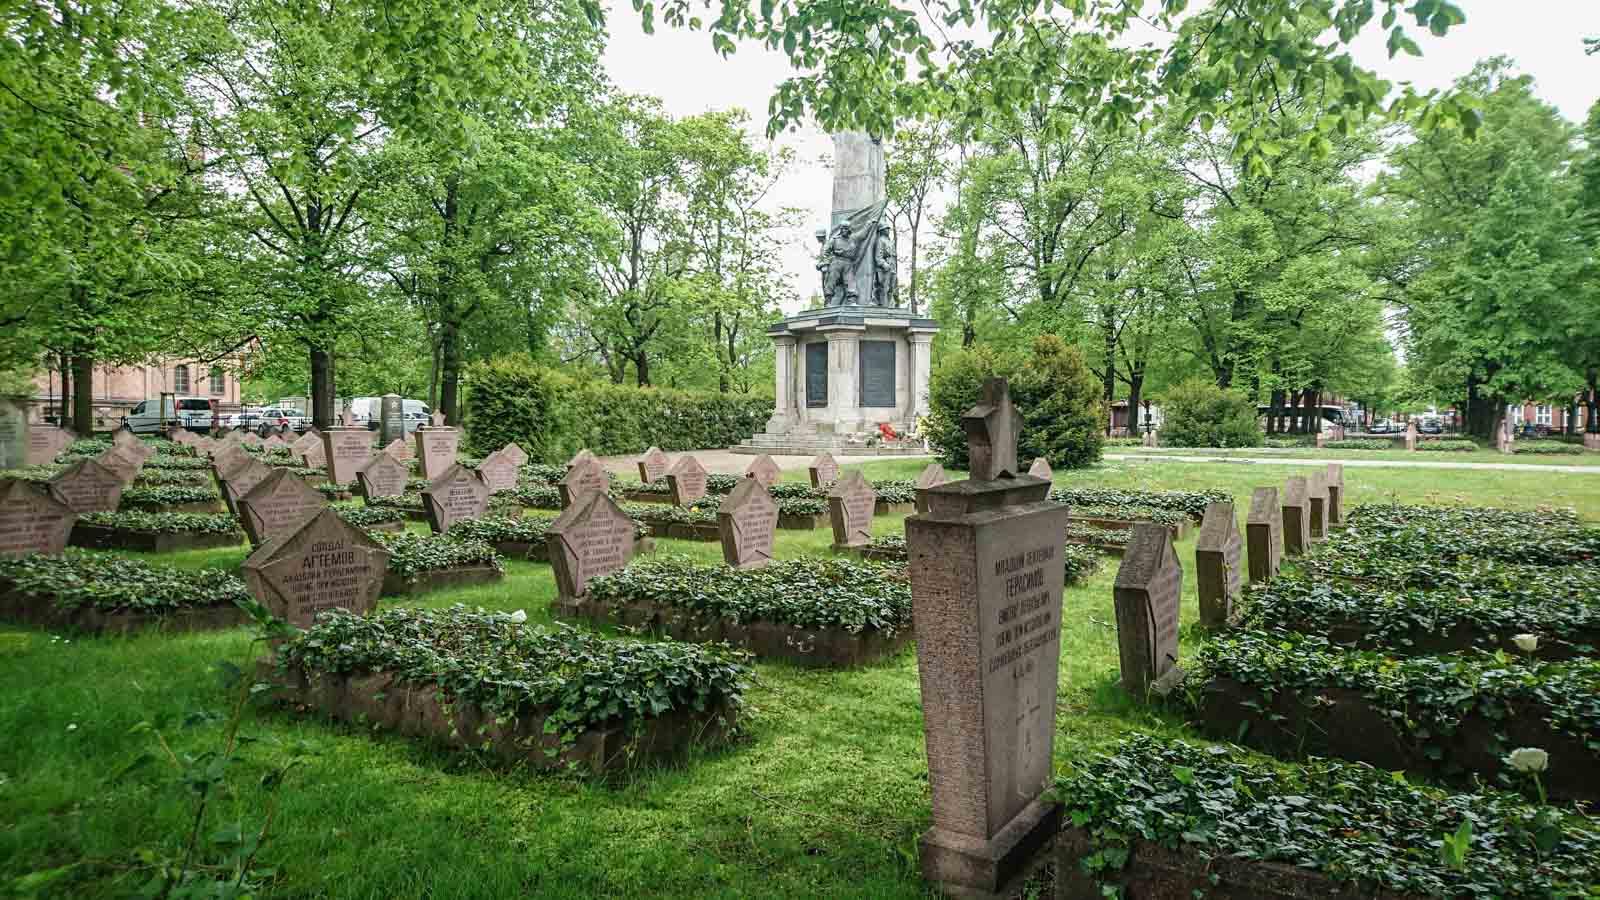 grabfeld sowjetischer ehrenfriedhof bassinplatz potsdam